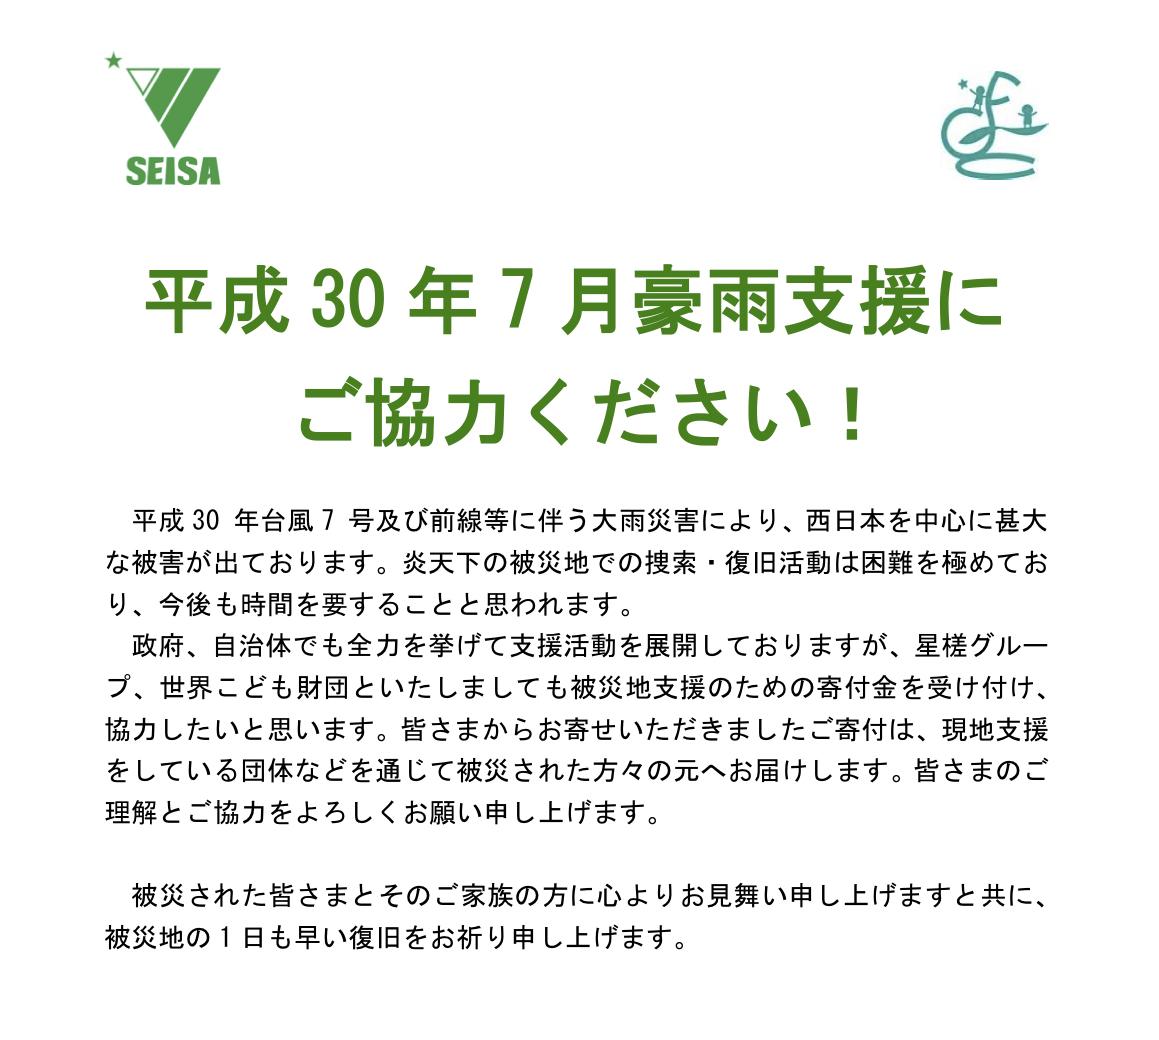 fgc_shien20180727_2.jpg